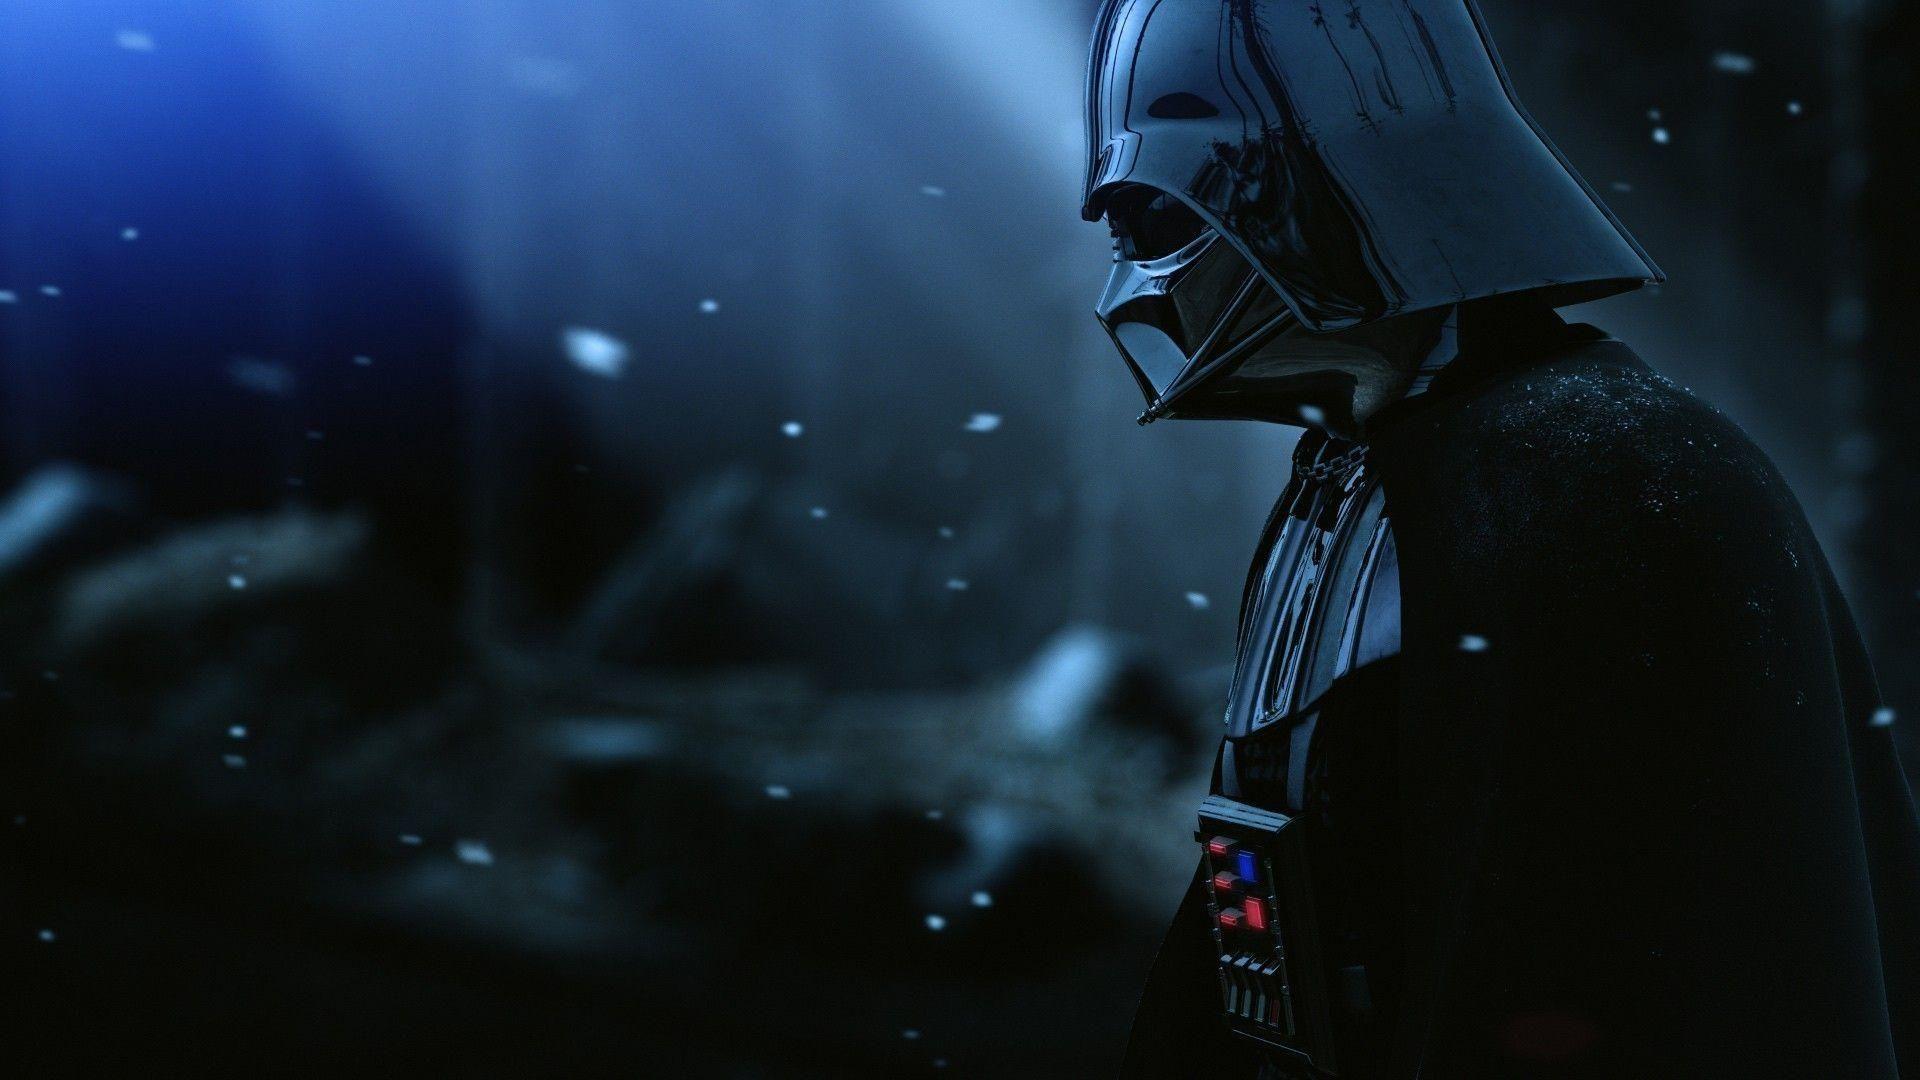 10 New Hd Star Wars Background Full Hd 1080p For Pc Background Bebe Biberon Fond Ecran